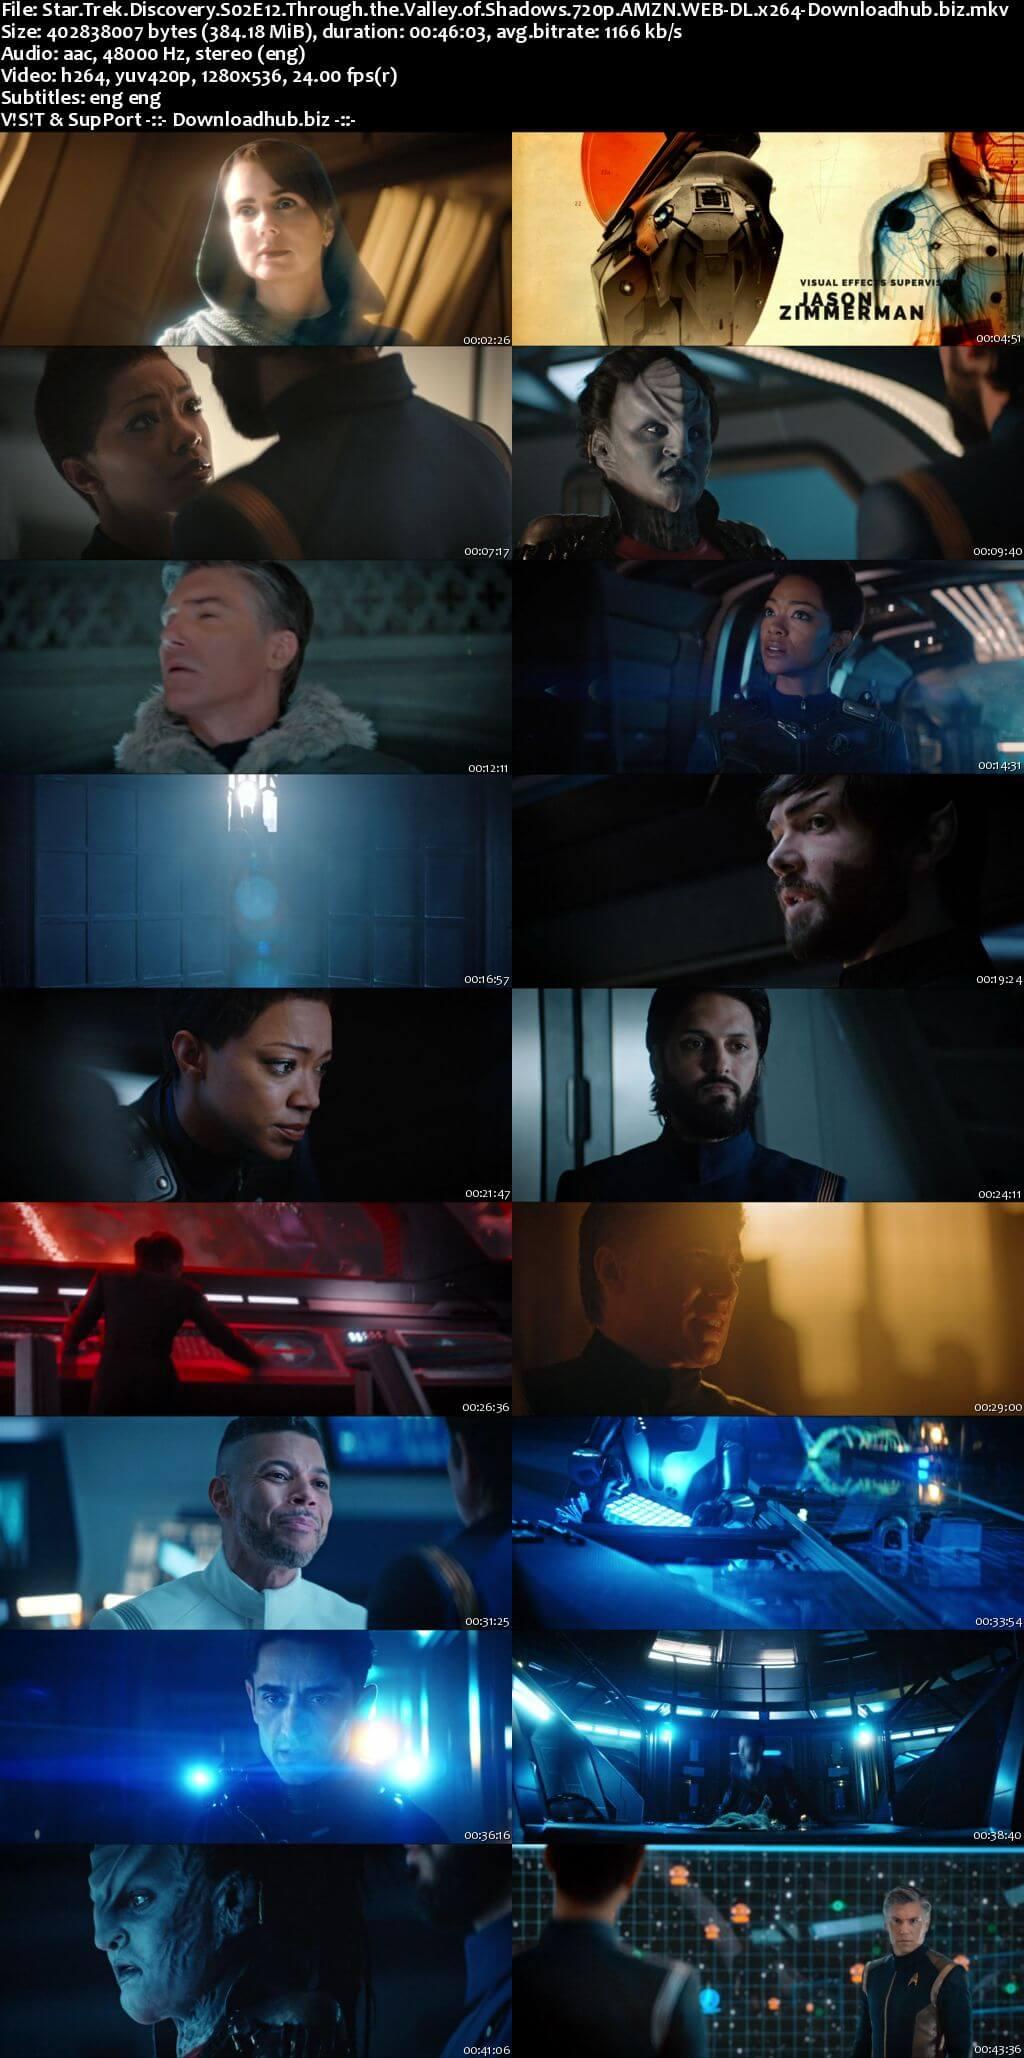 Star Trek Discovery S02E12 350MB AMZN WEB-DL 720p ESubs